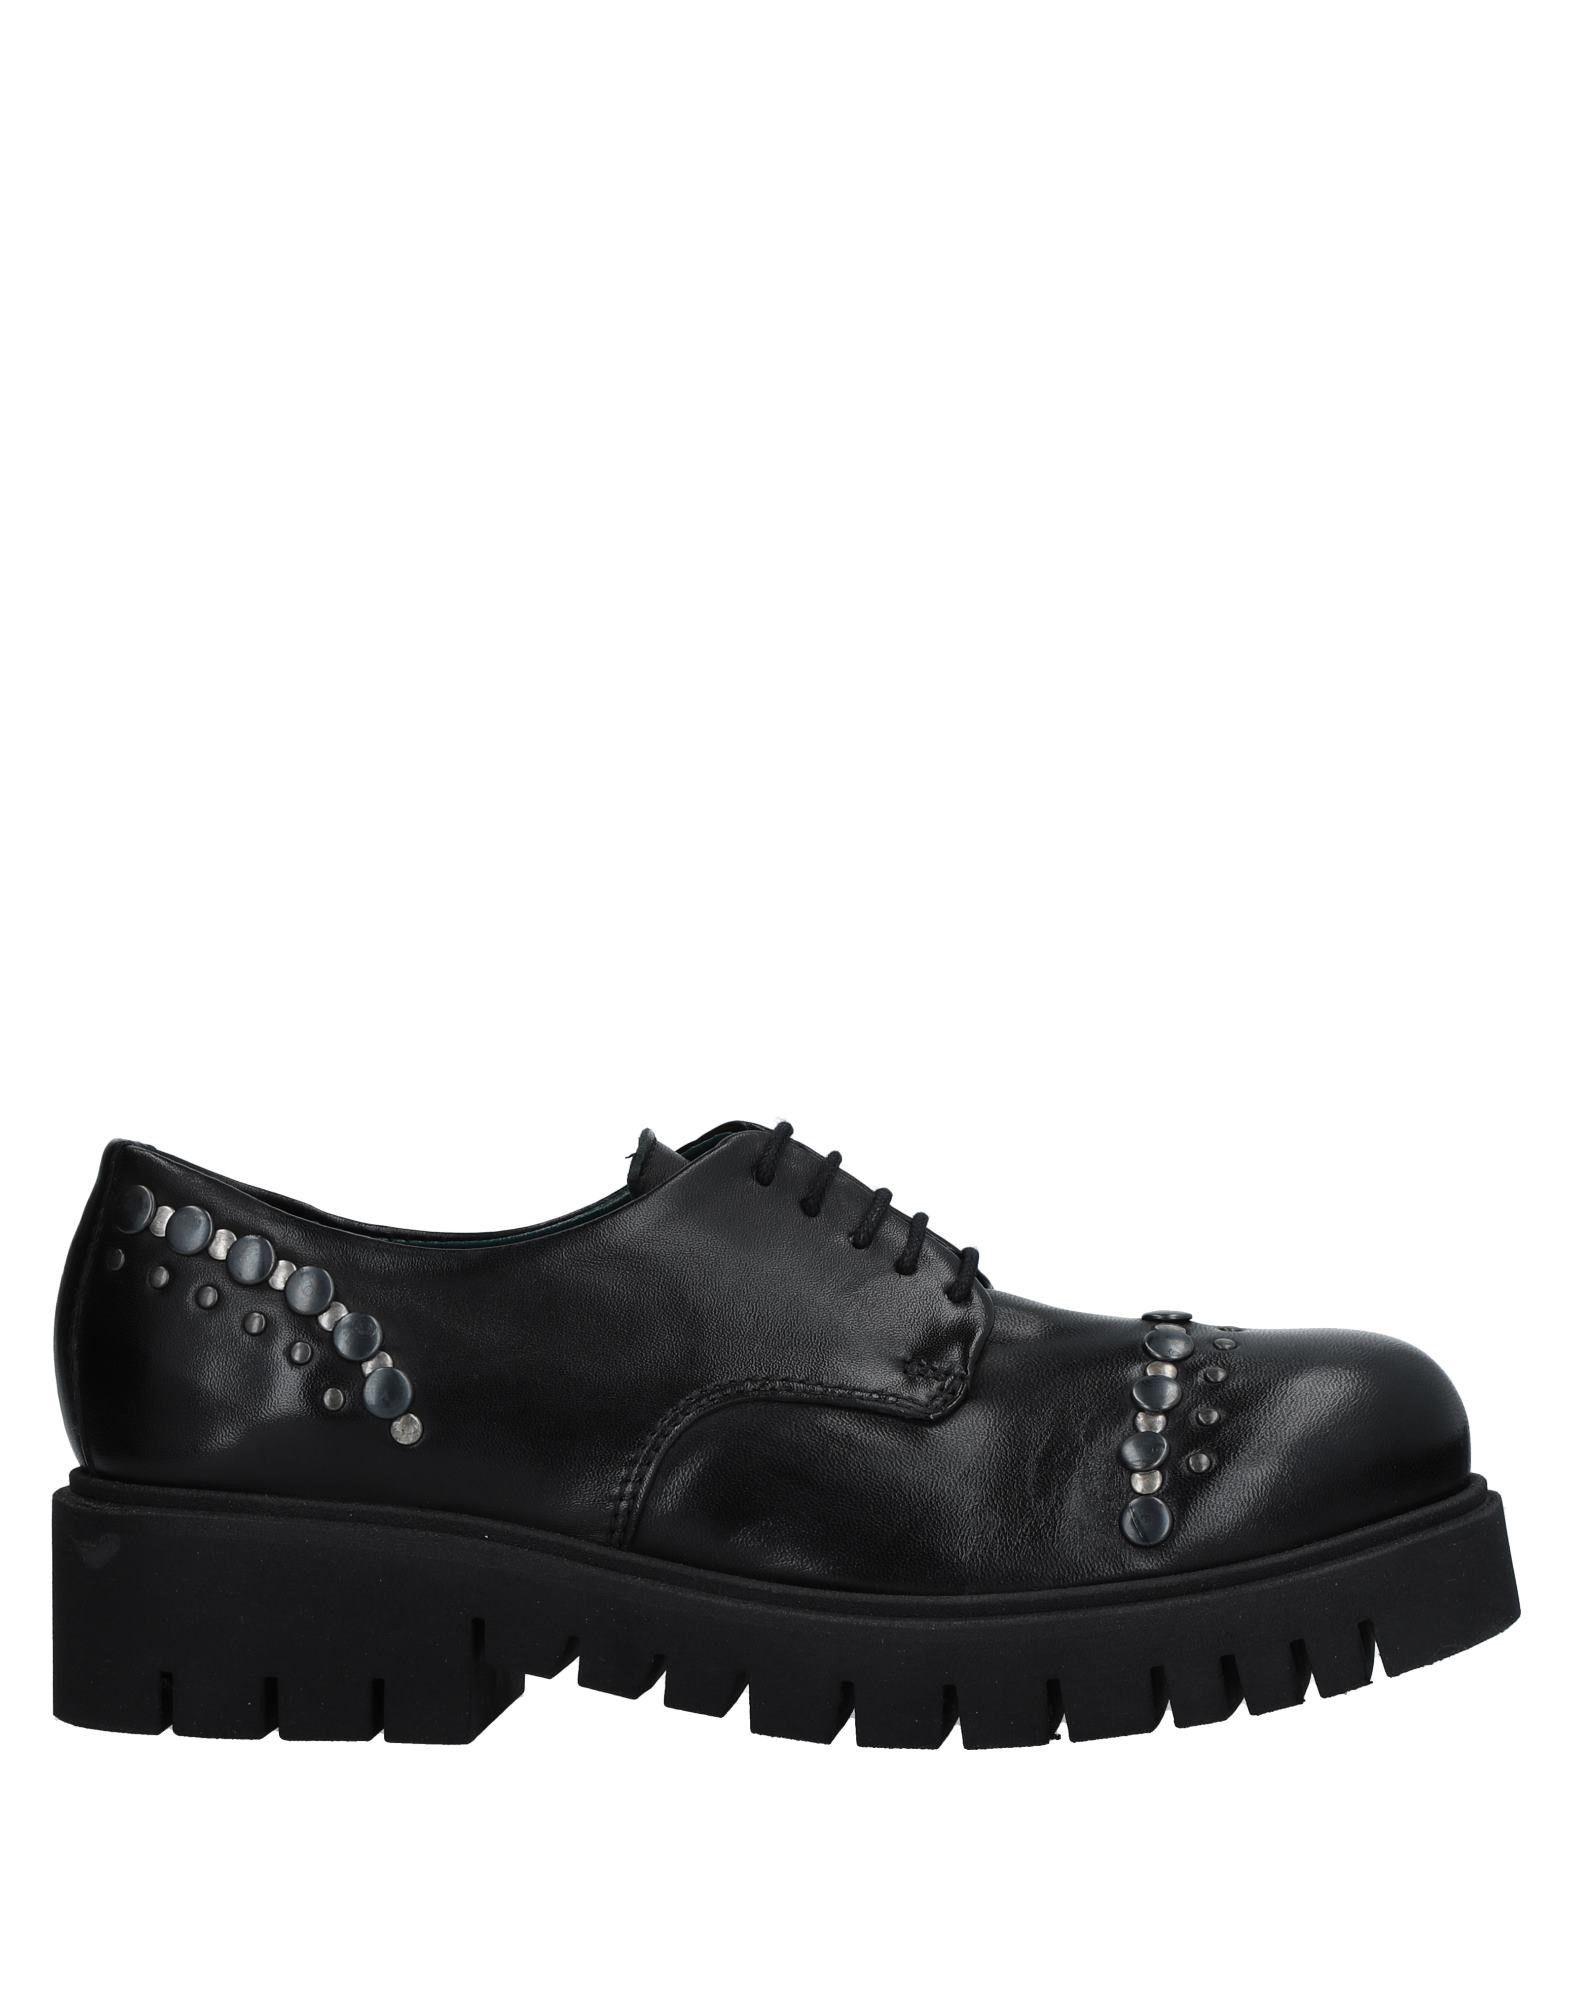 Fabbrica Deicolli Schnürschuhe Damen  11524865OQ Gute Qualität beliebte Schuhe